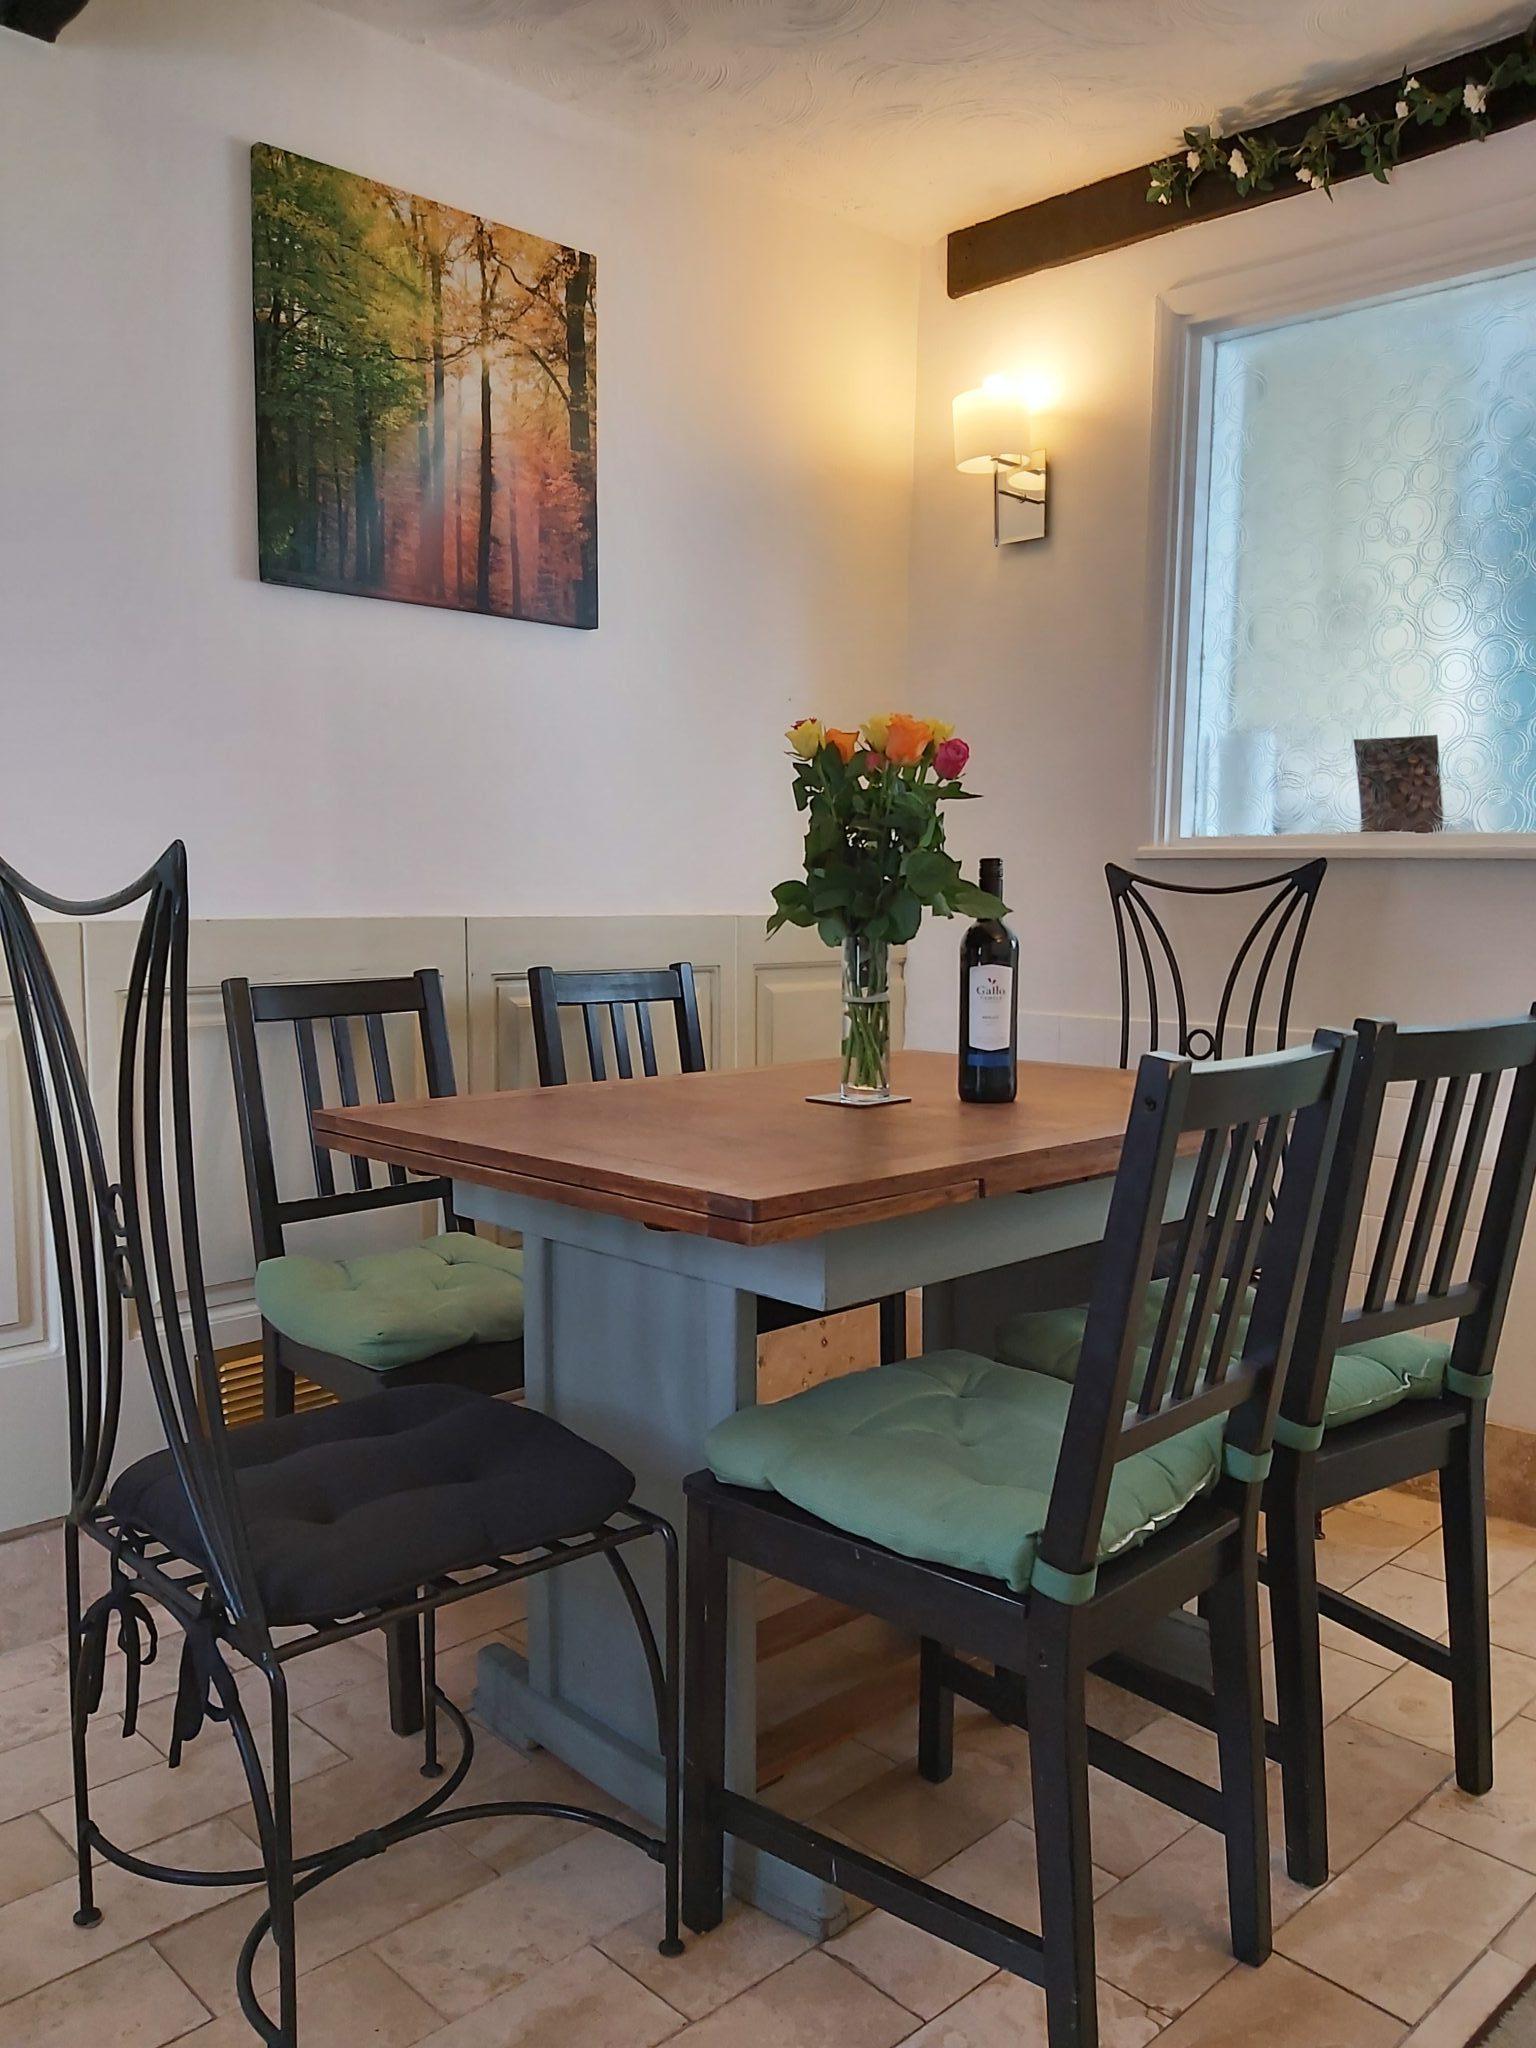 Dining room - flowers & wine